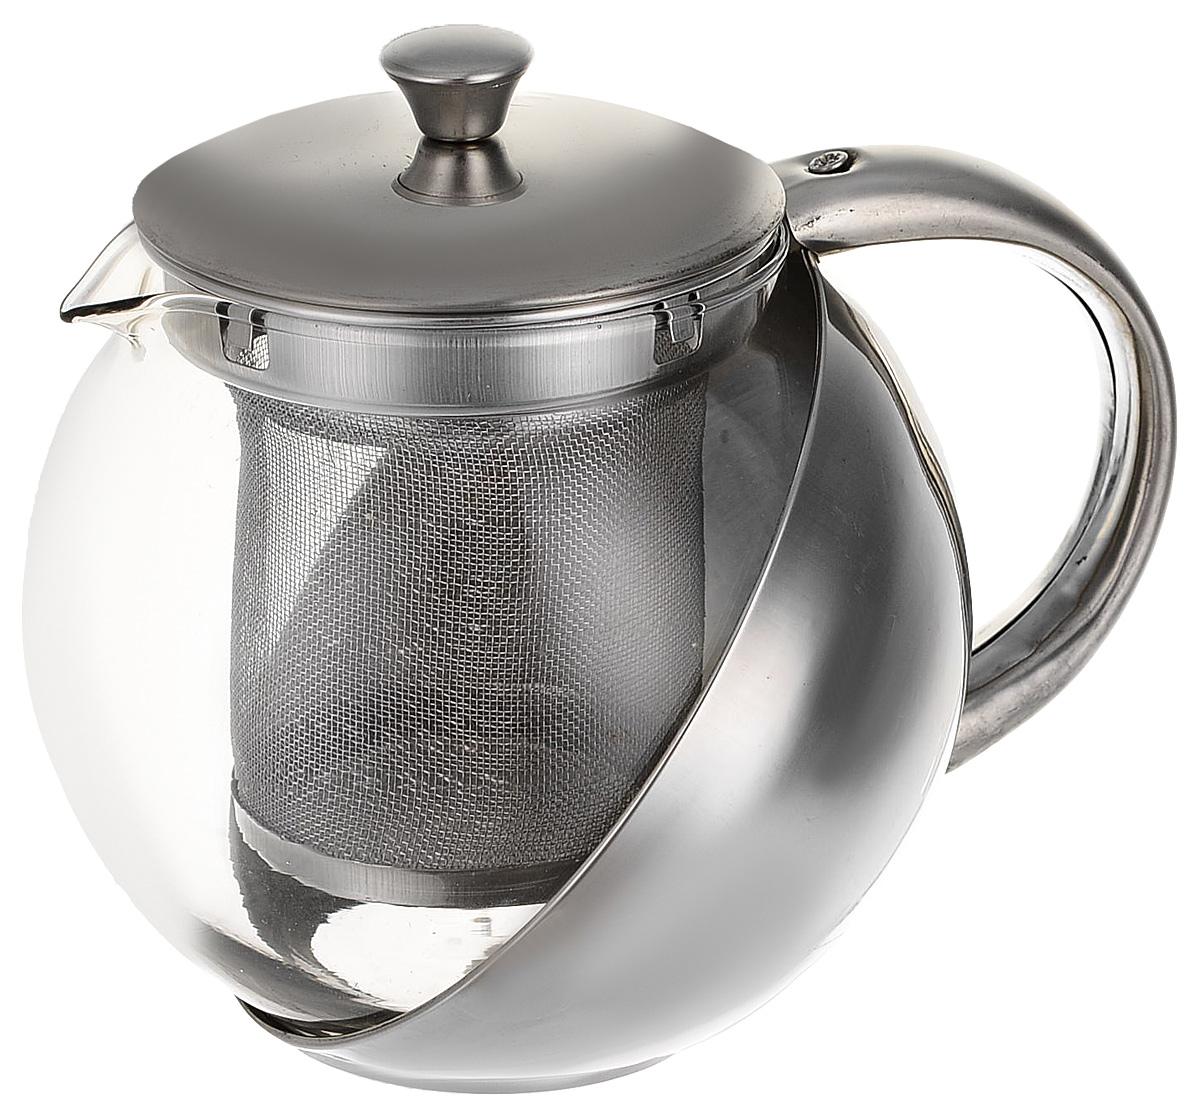 Чайник заварочный BHK, с фильтром, 500 мл заварочный чайник 1 4 л bhk 5420068